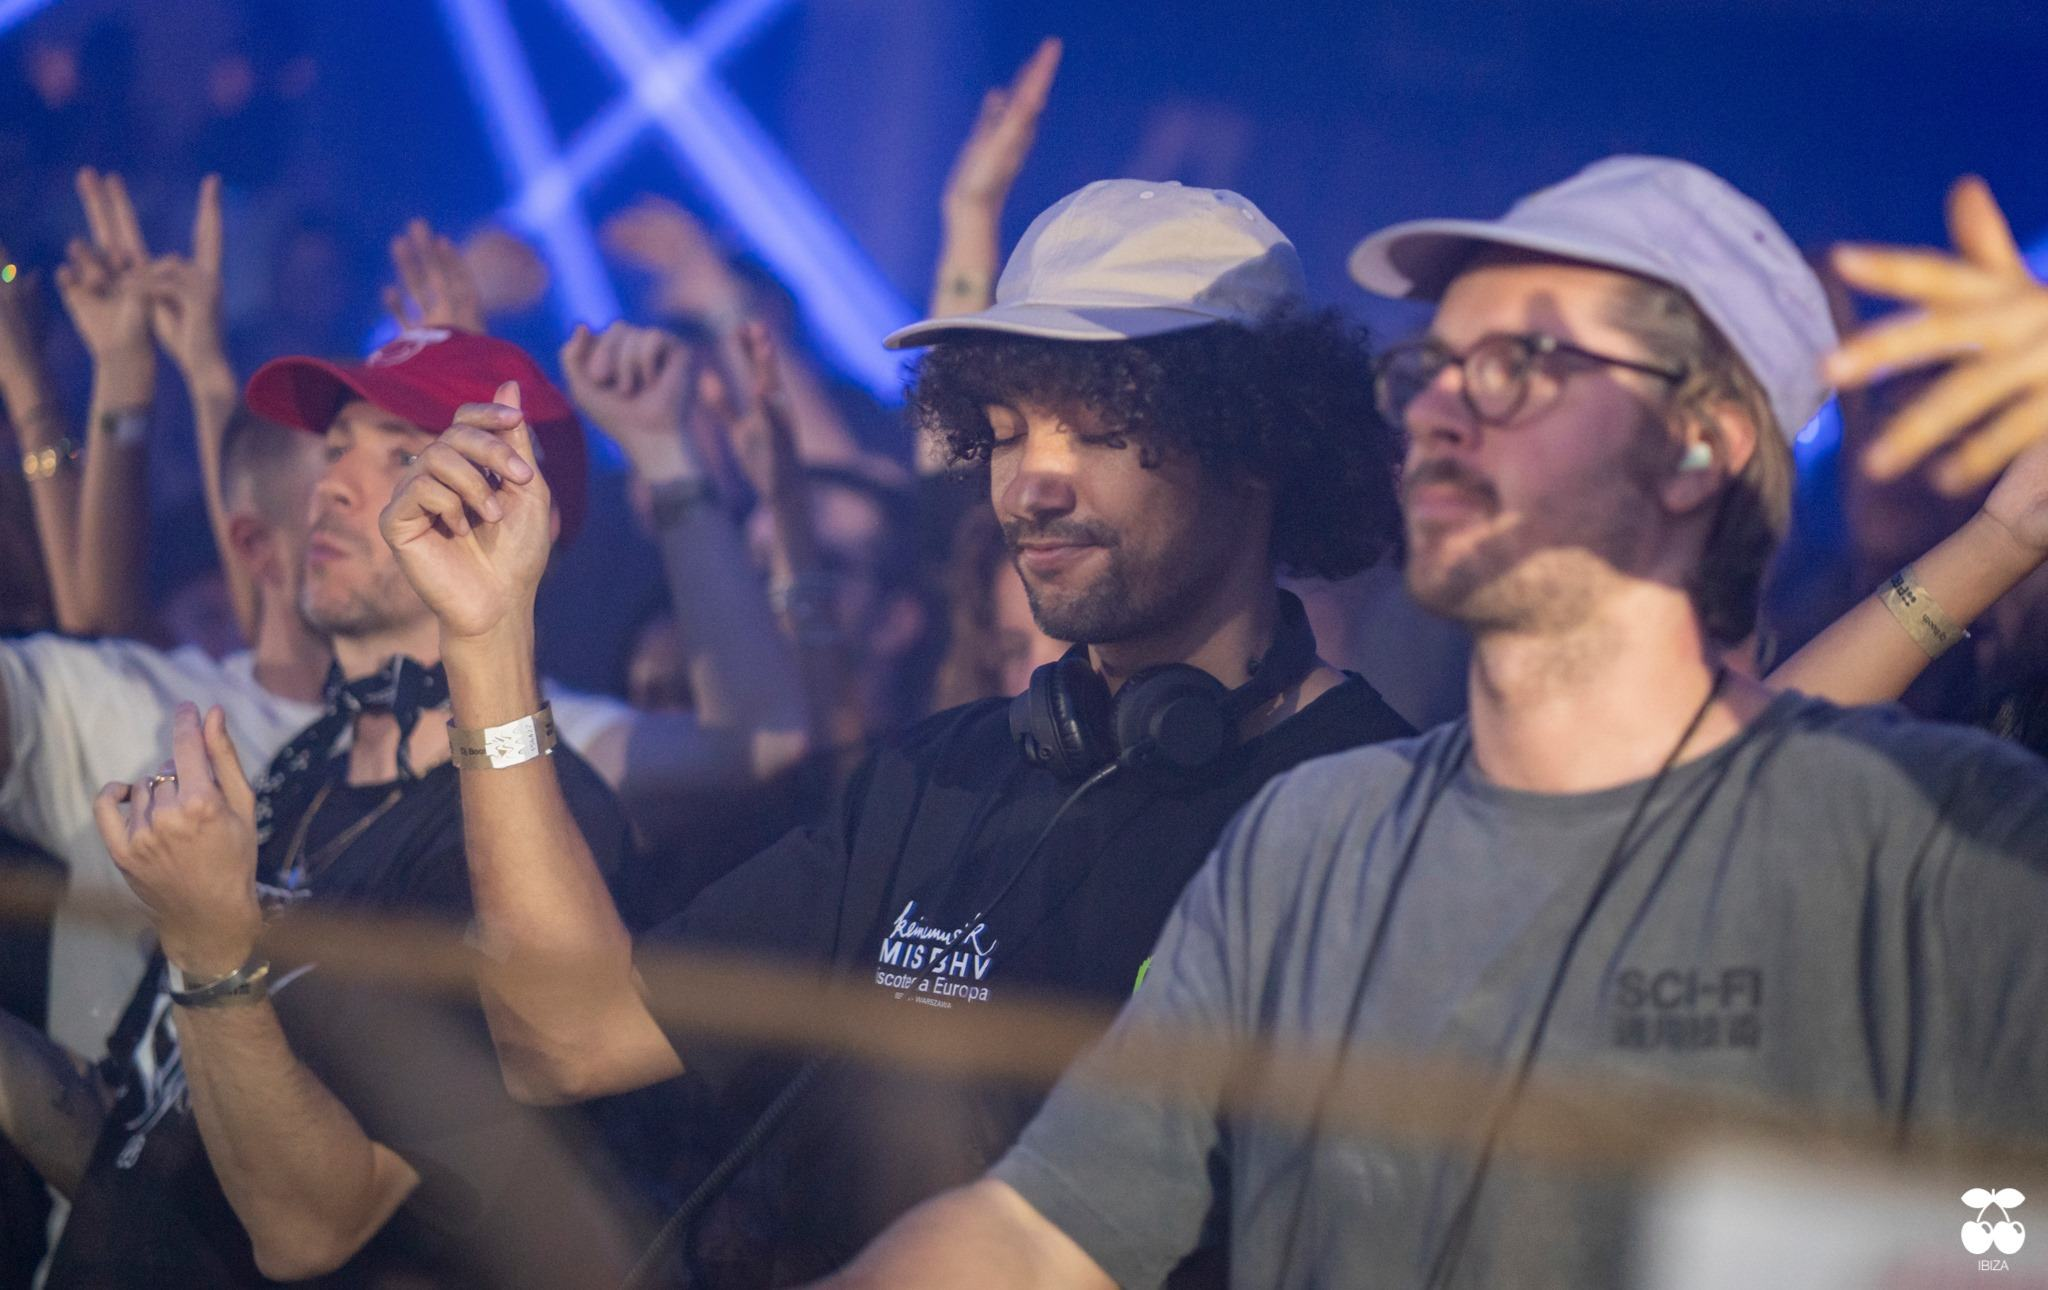 Buy tickets Solomun 2020 Pacha Ibiza, party photos